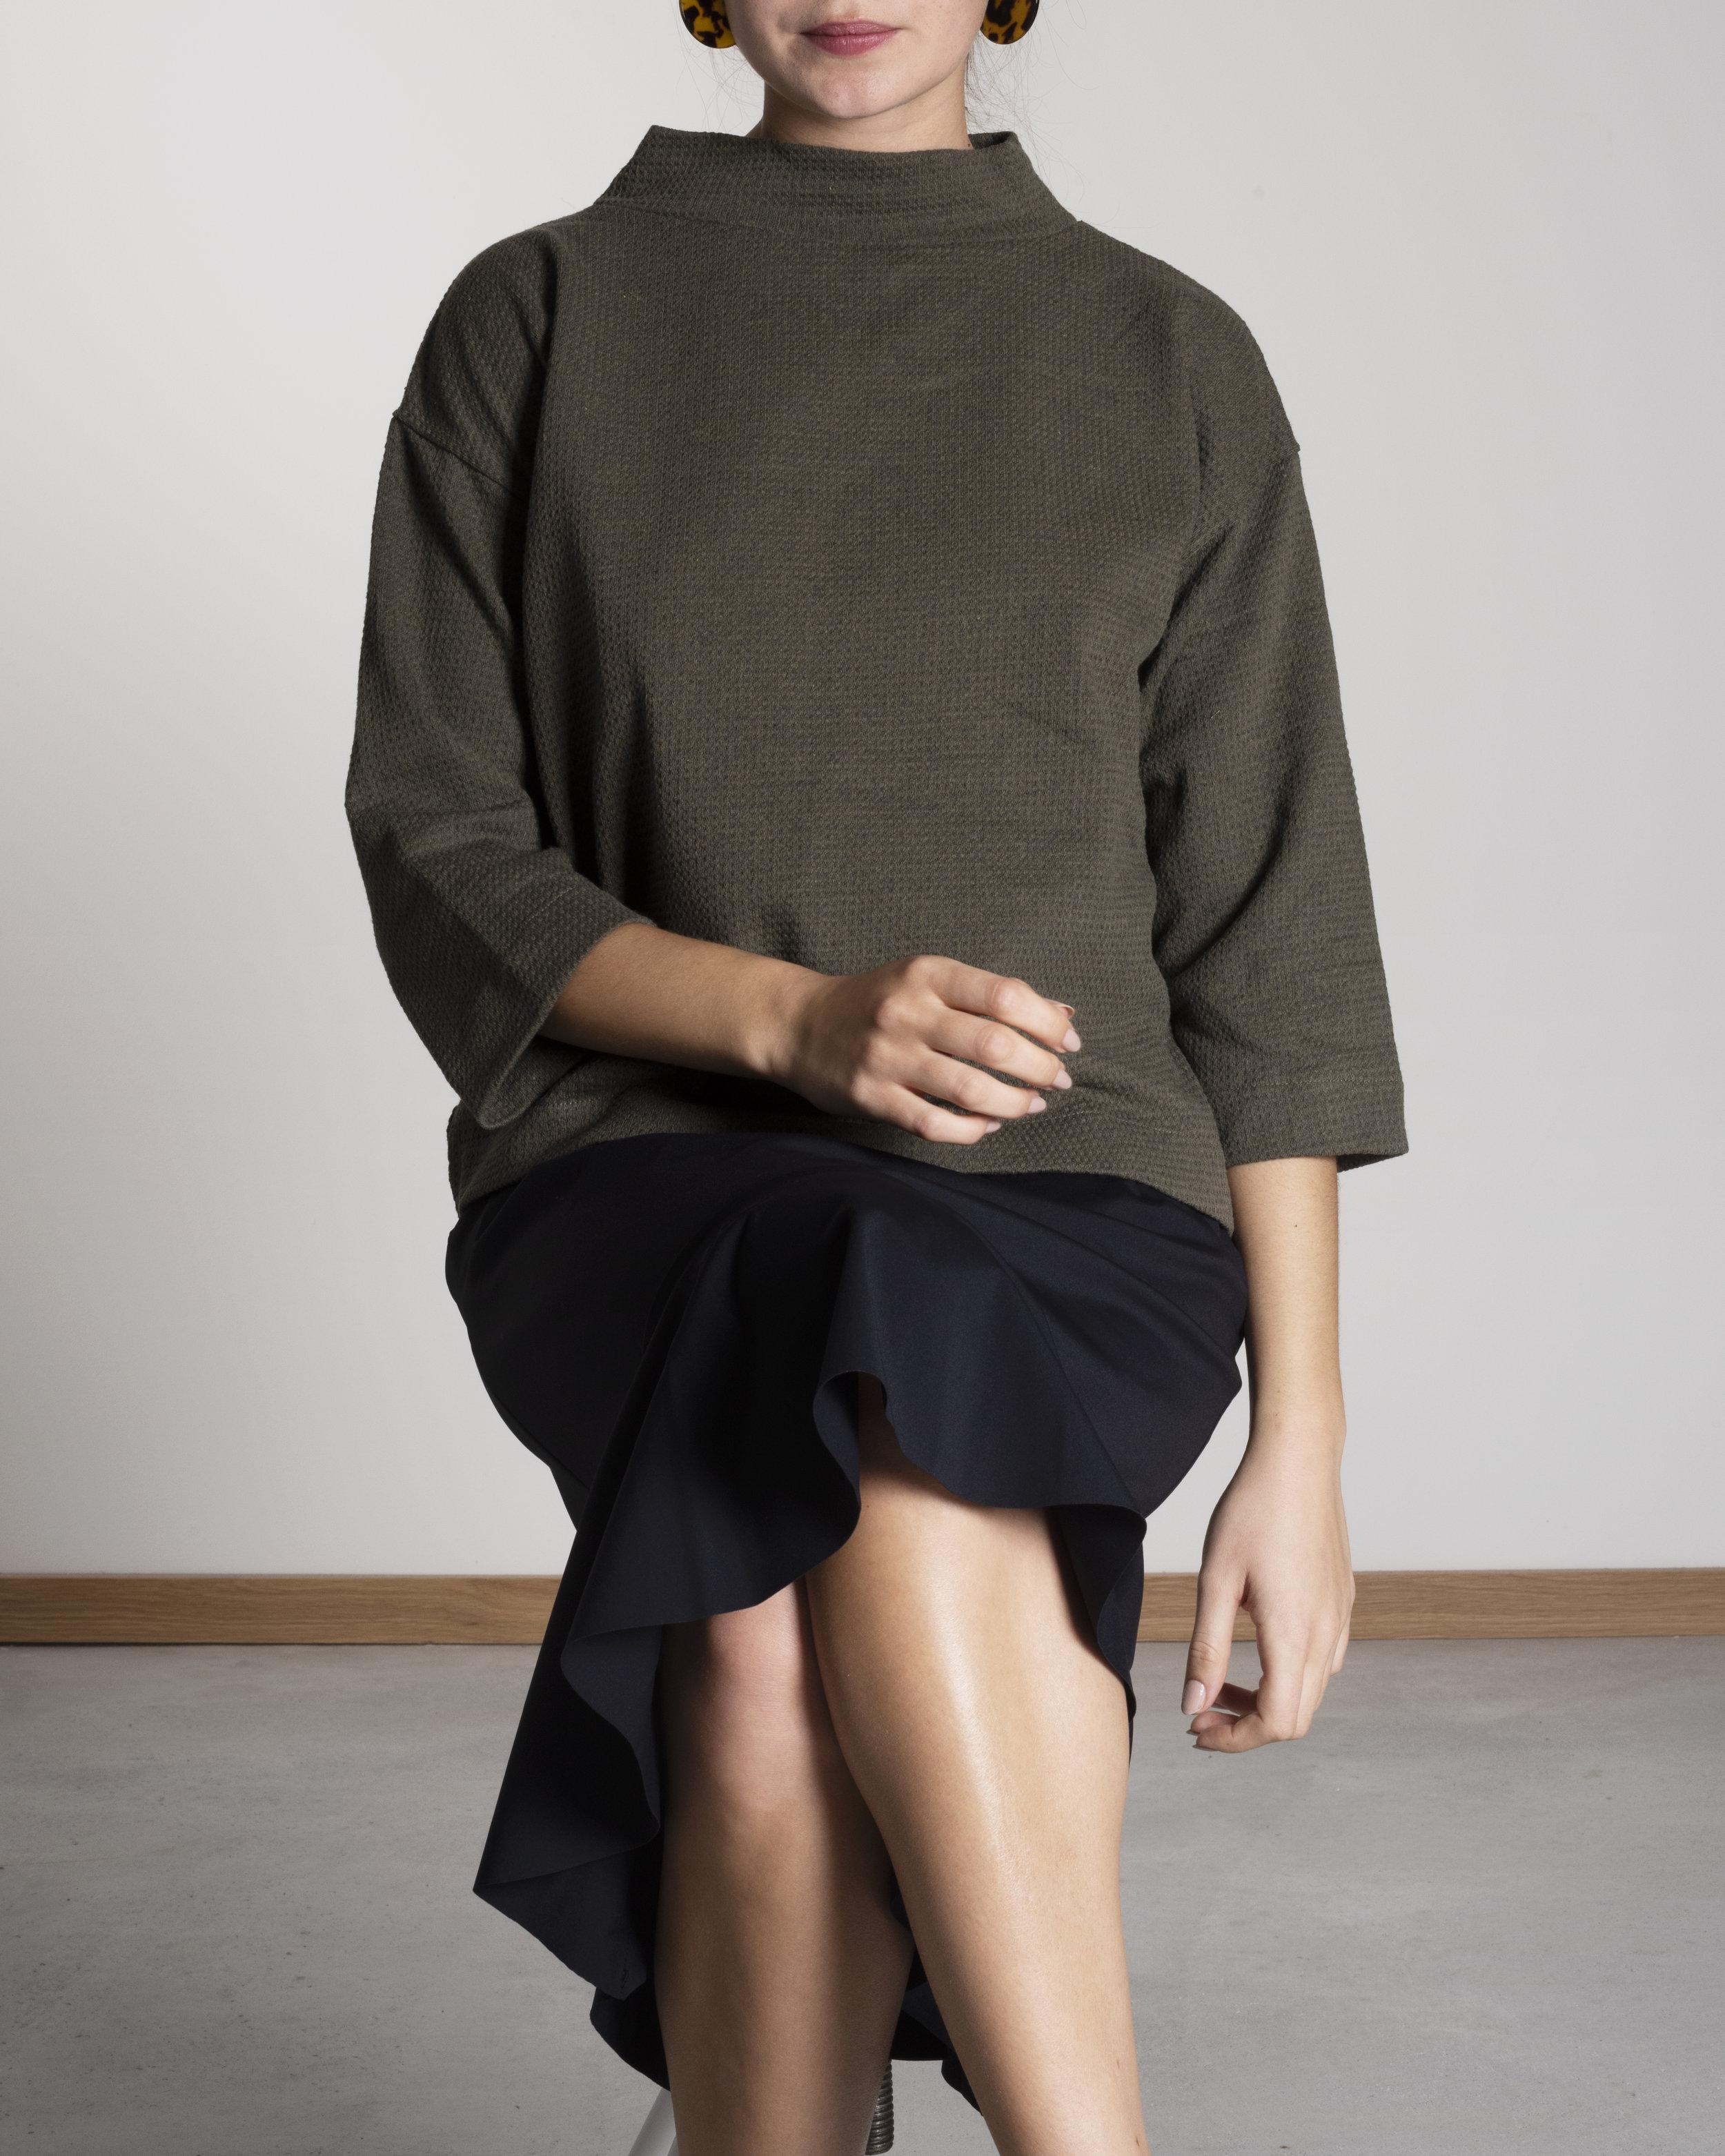 SORA Dress black+ KALLISTO olive.jpg